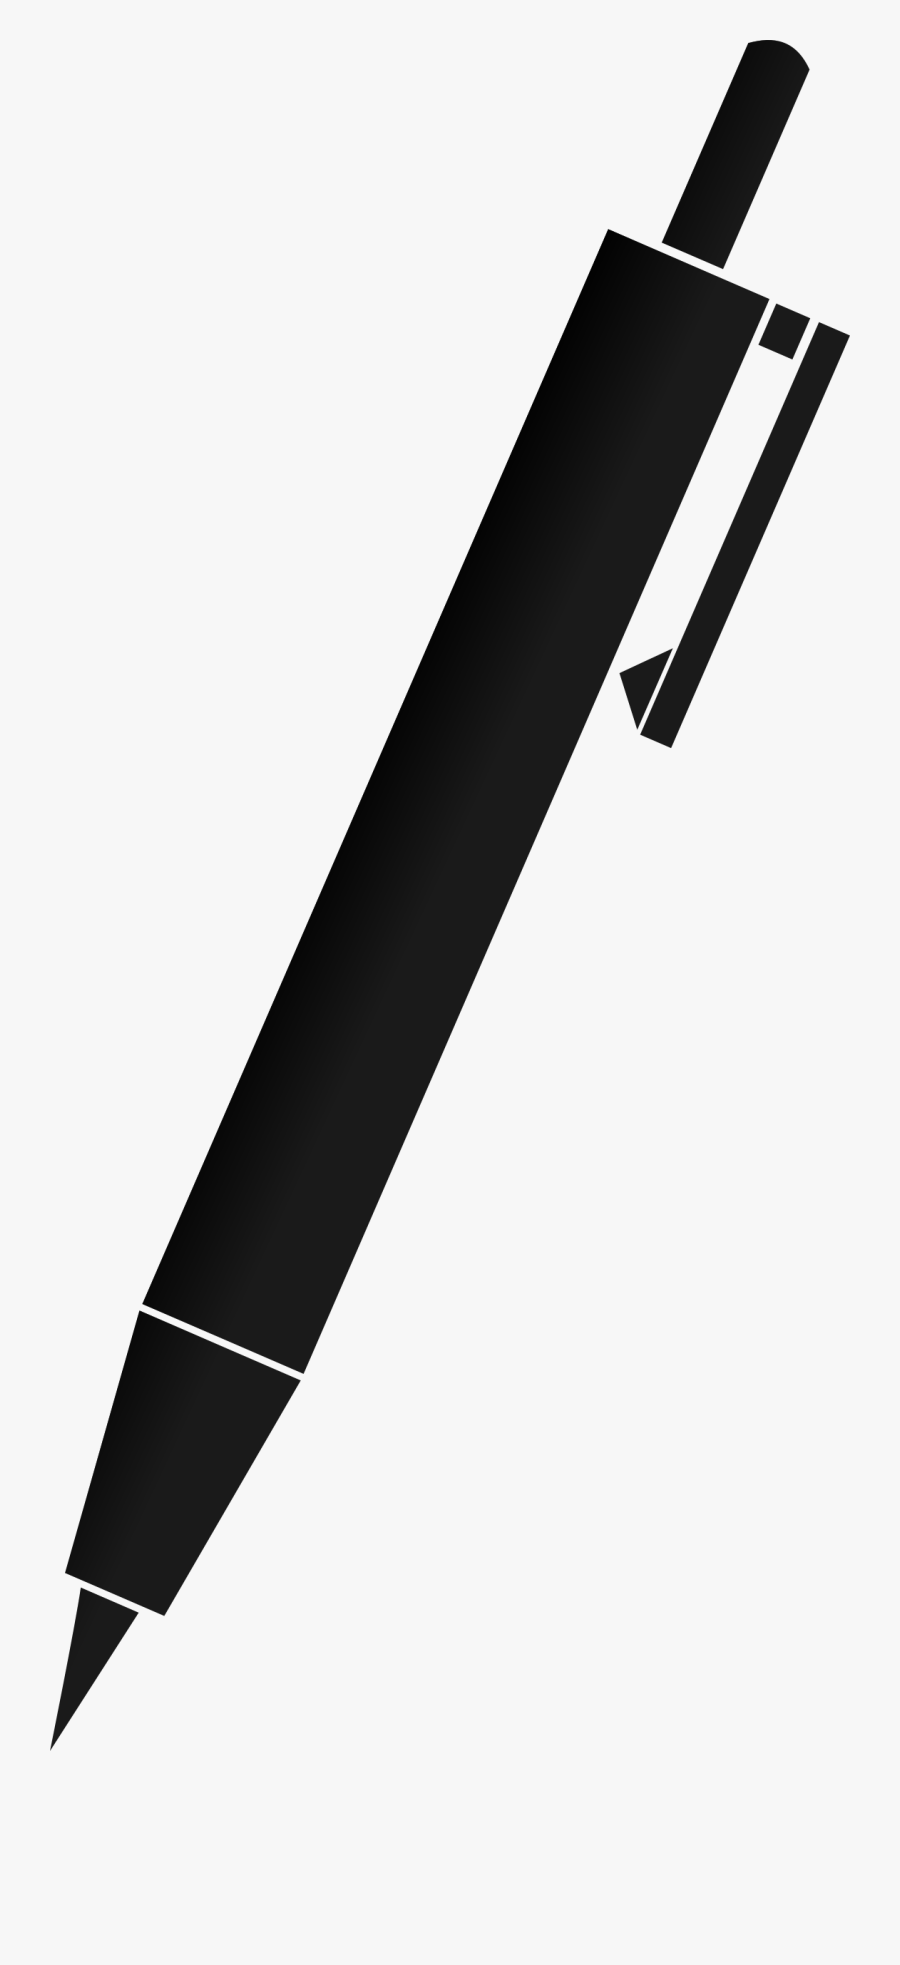 big image png black pen clipart free transparent clipart clipartkey big image png black pen clipart